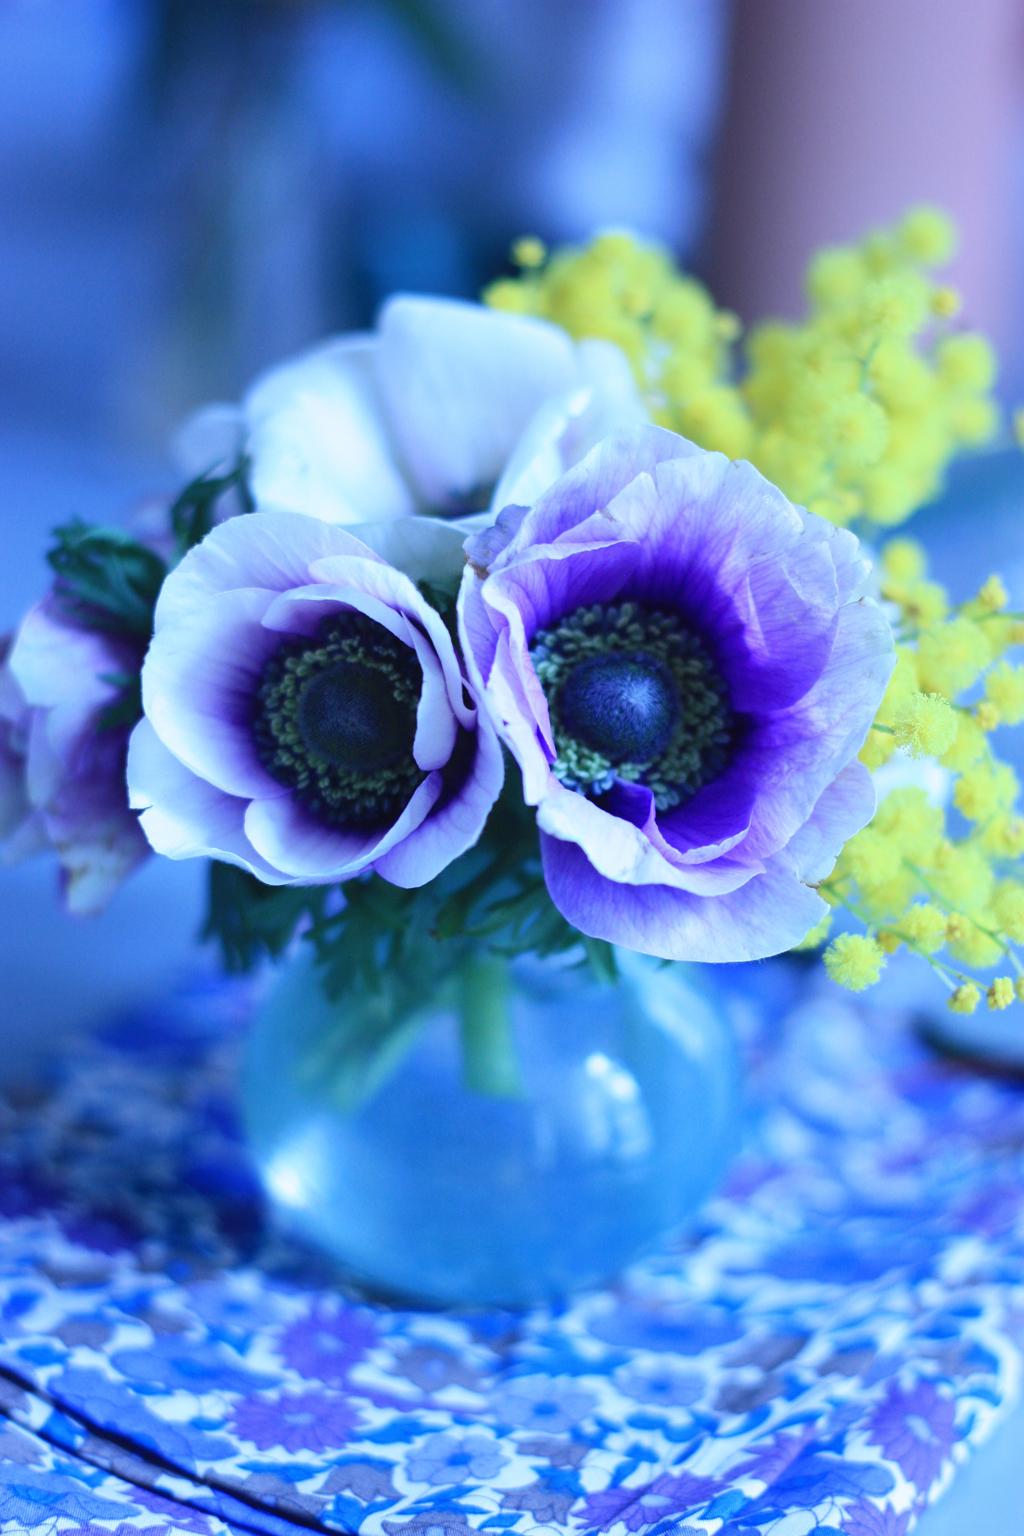 Comment Conserver Du Muguet En Vase blog — elodie love floral photography